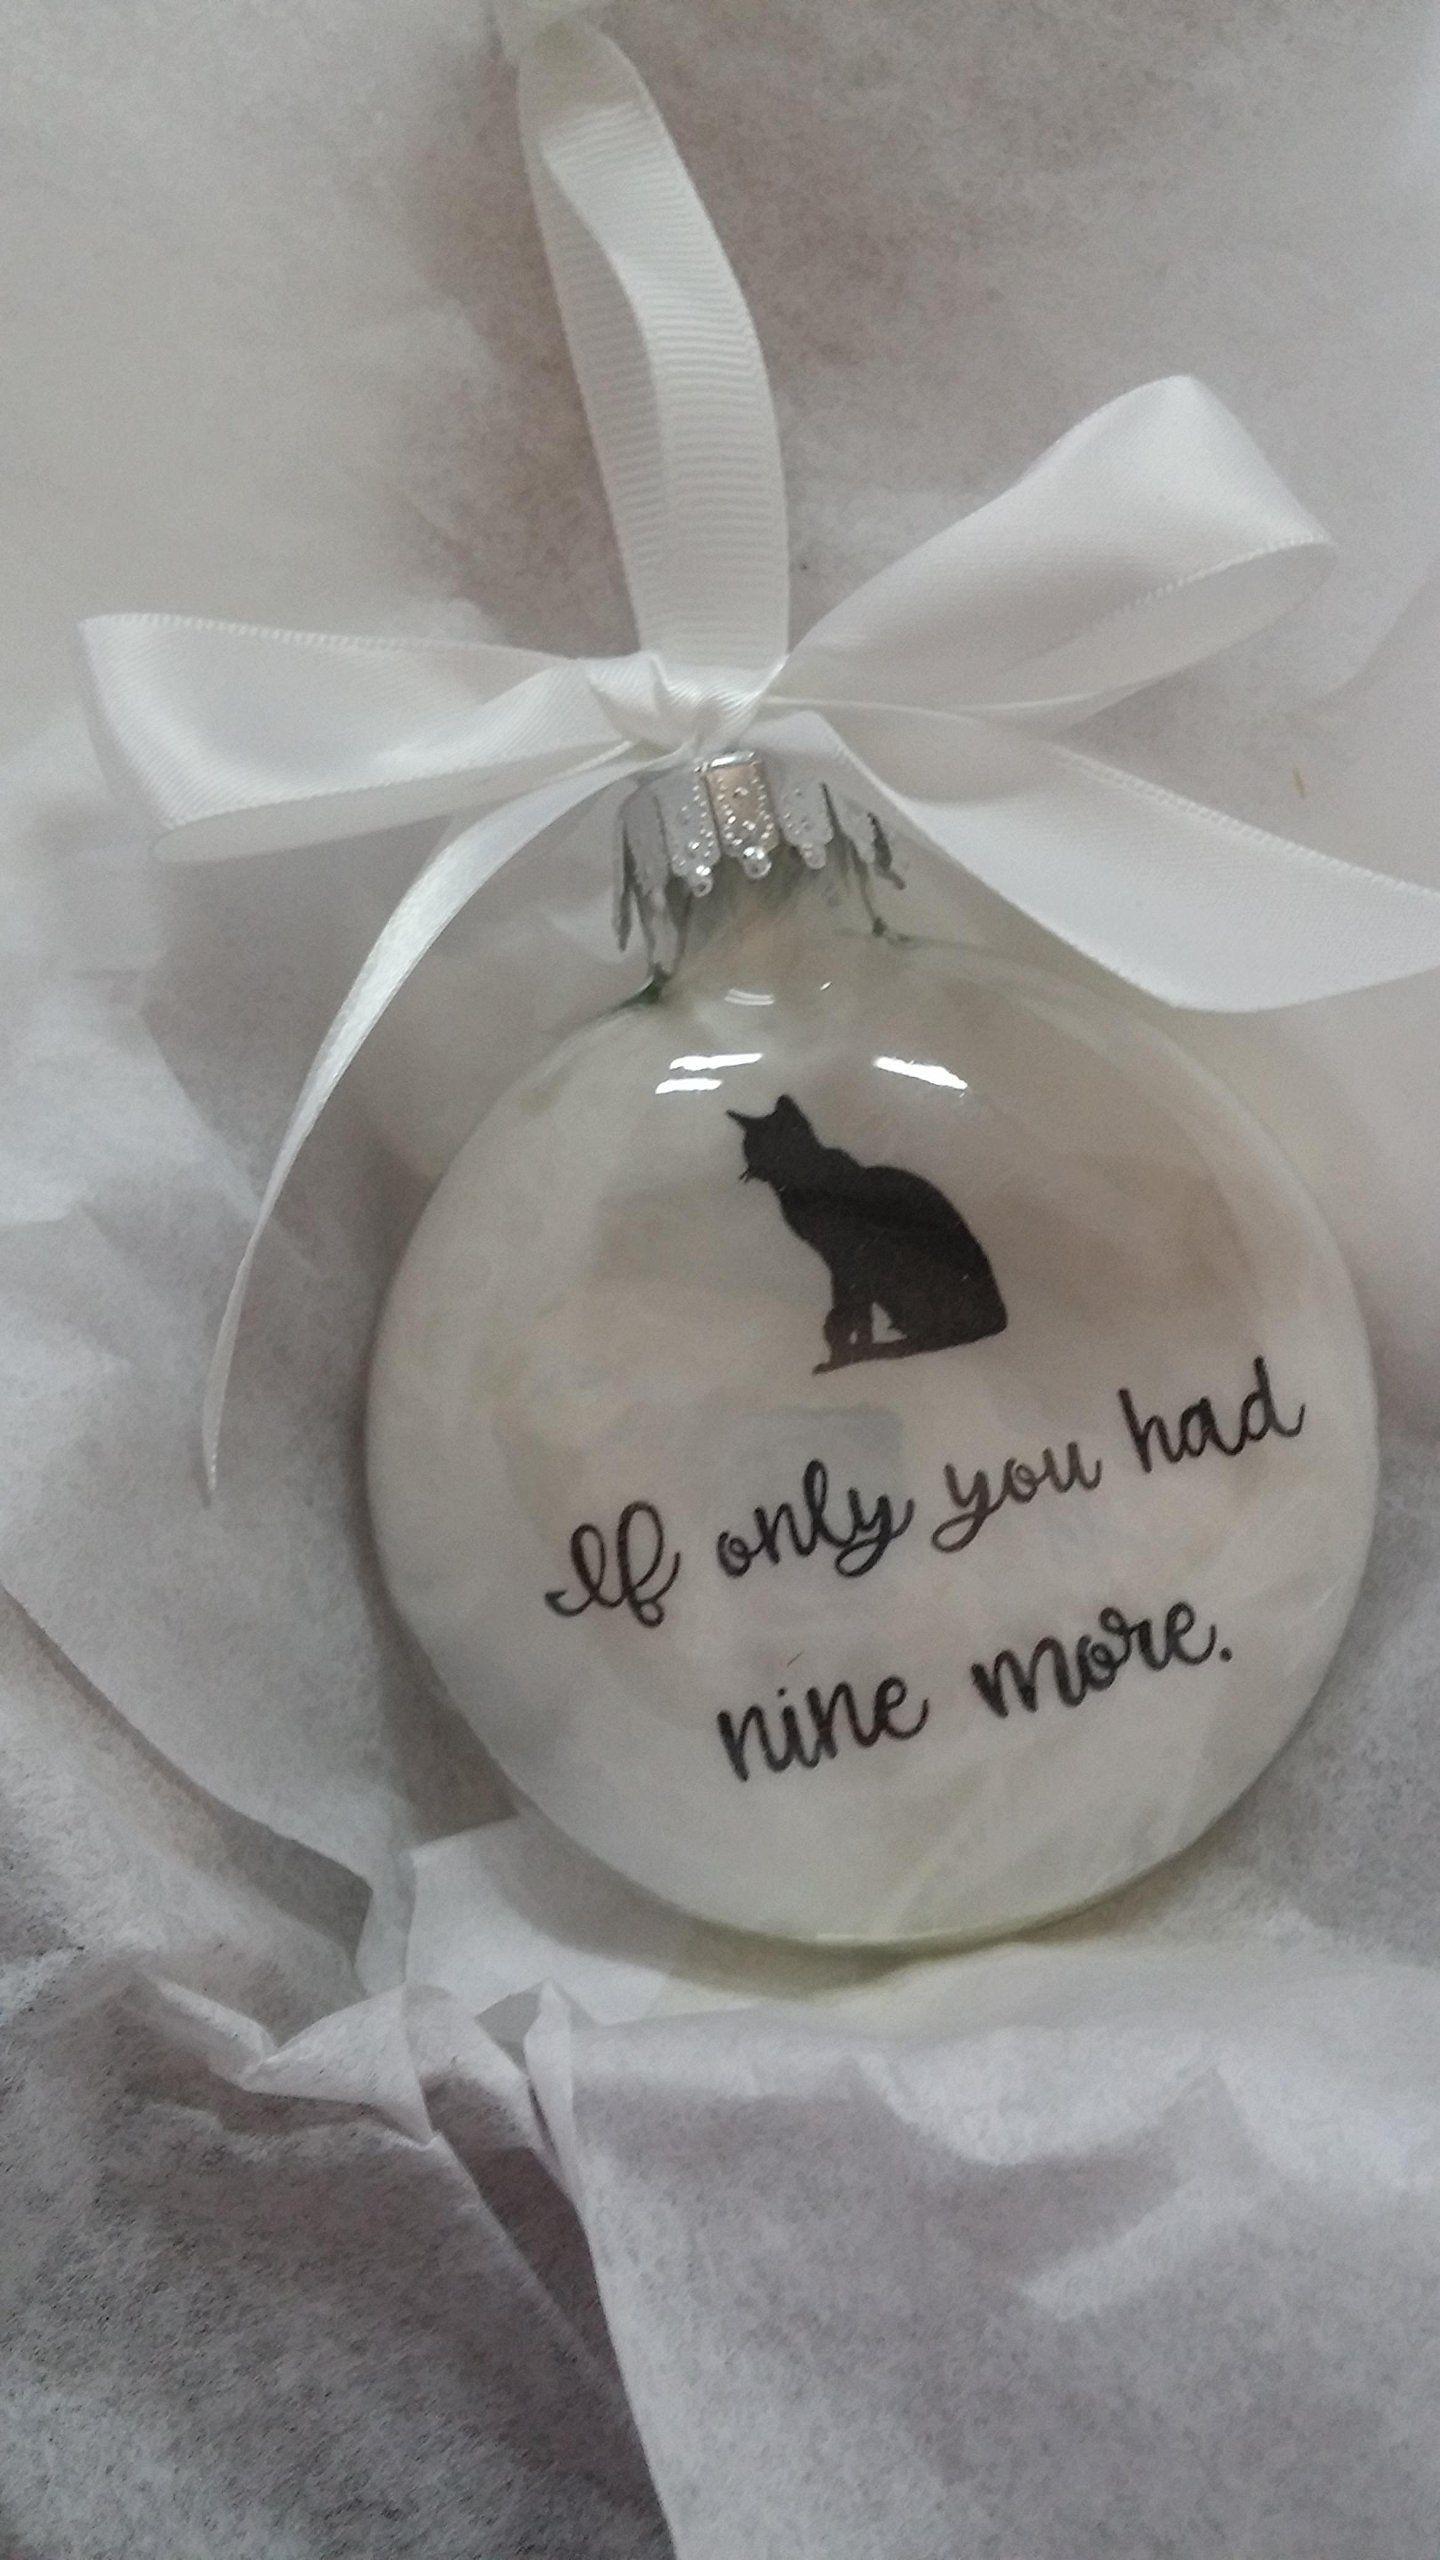 Cat loss pet memorial personalized ornament w optl charm